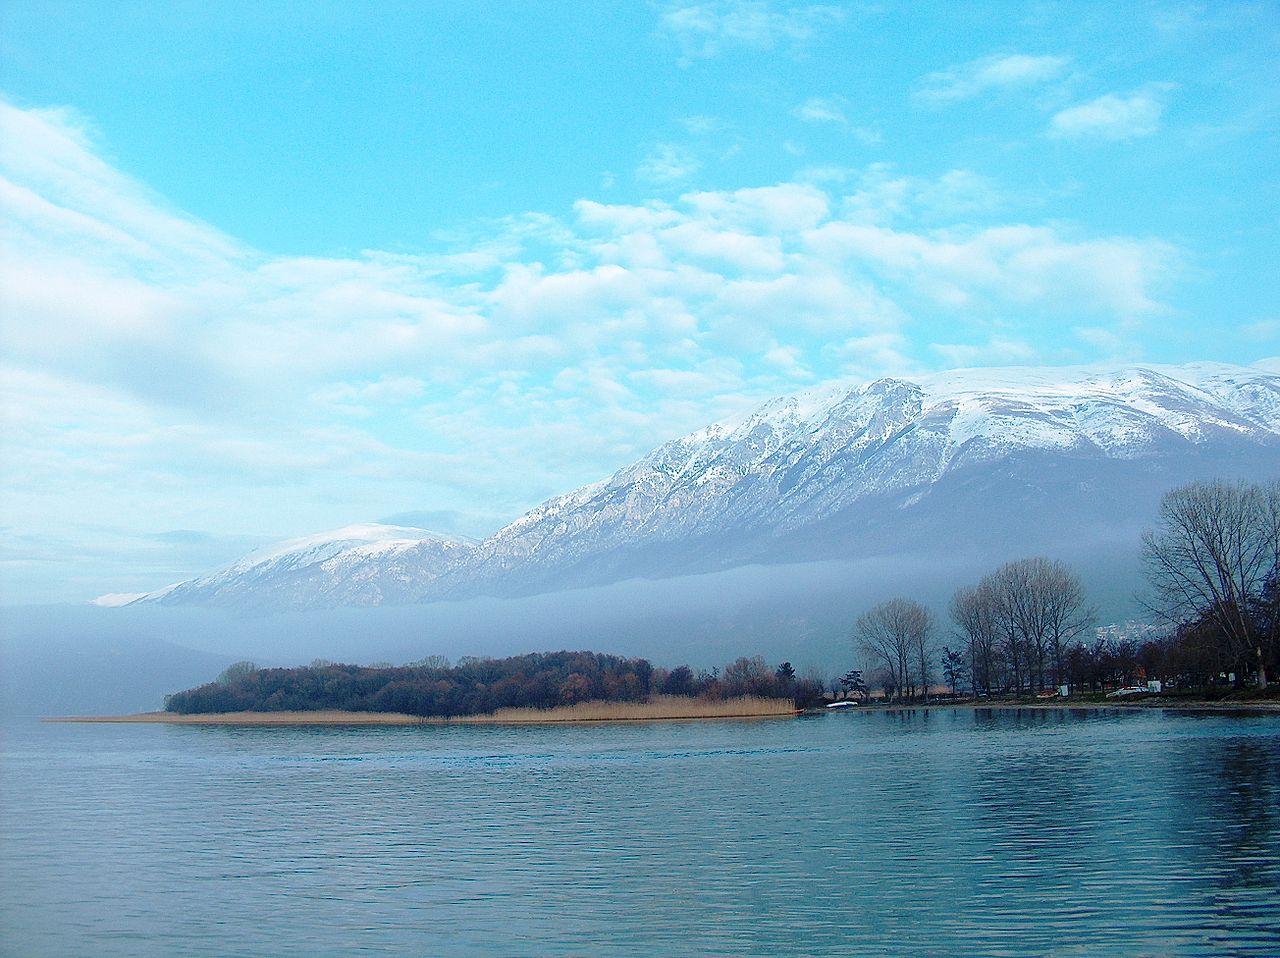 Охридское озеро, вид на гору Галичица